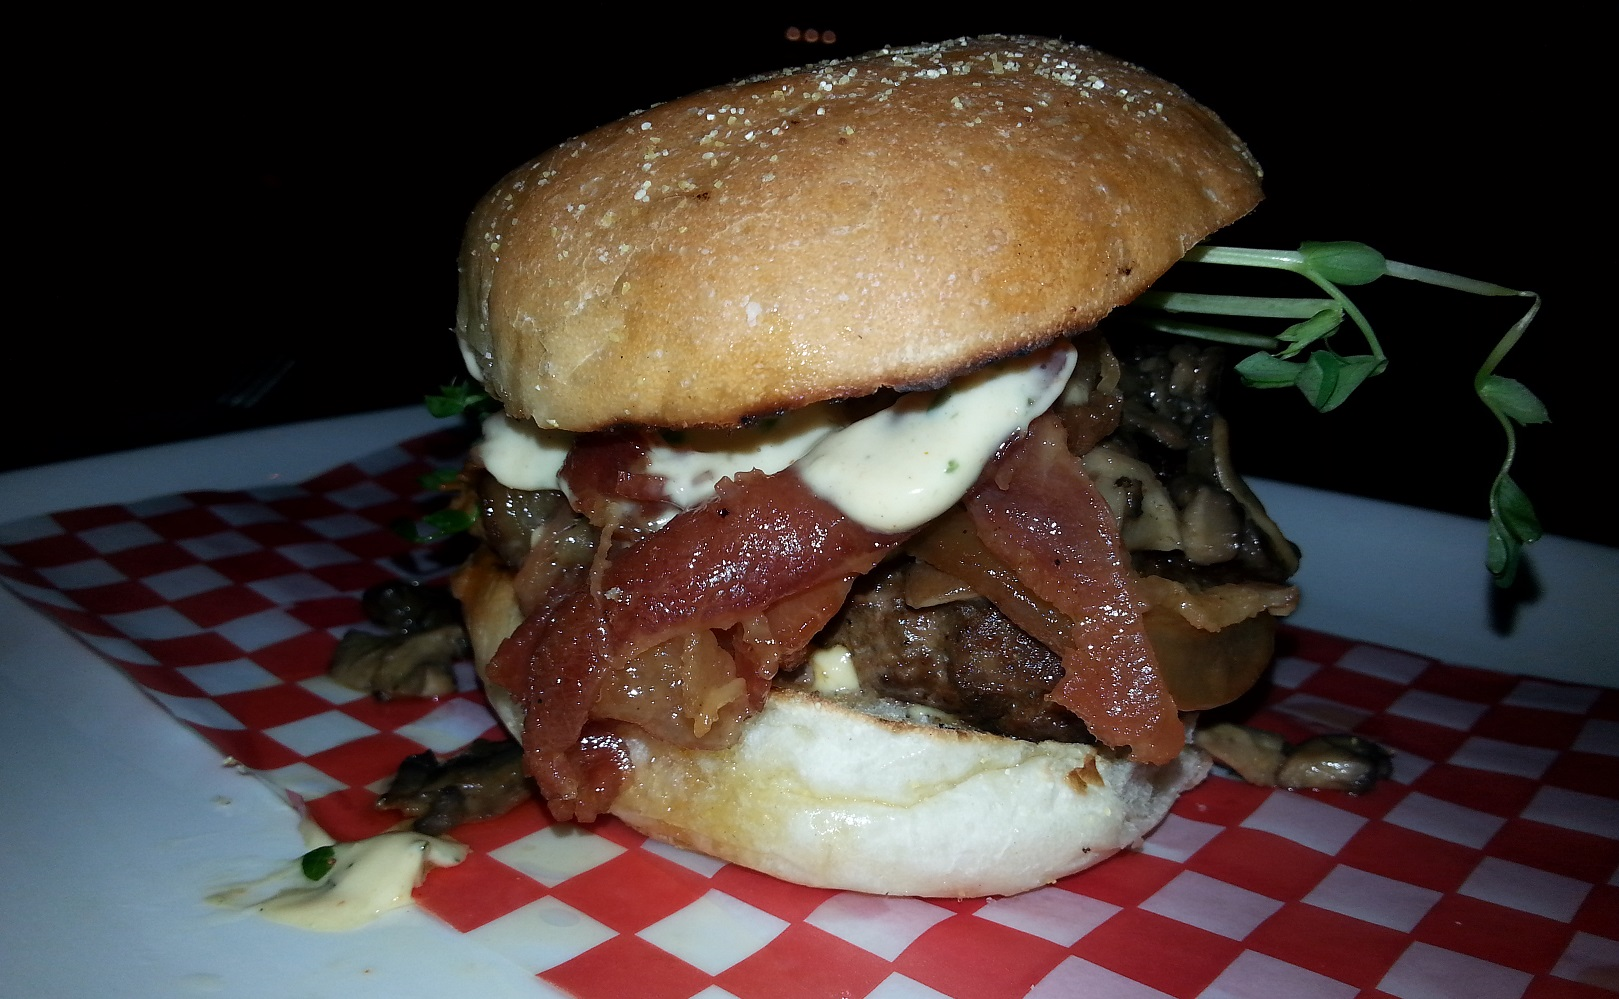 PEI Burger Love - Sims Corner Steakhouse & Oyster Bar